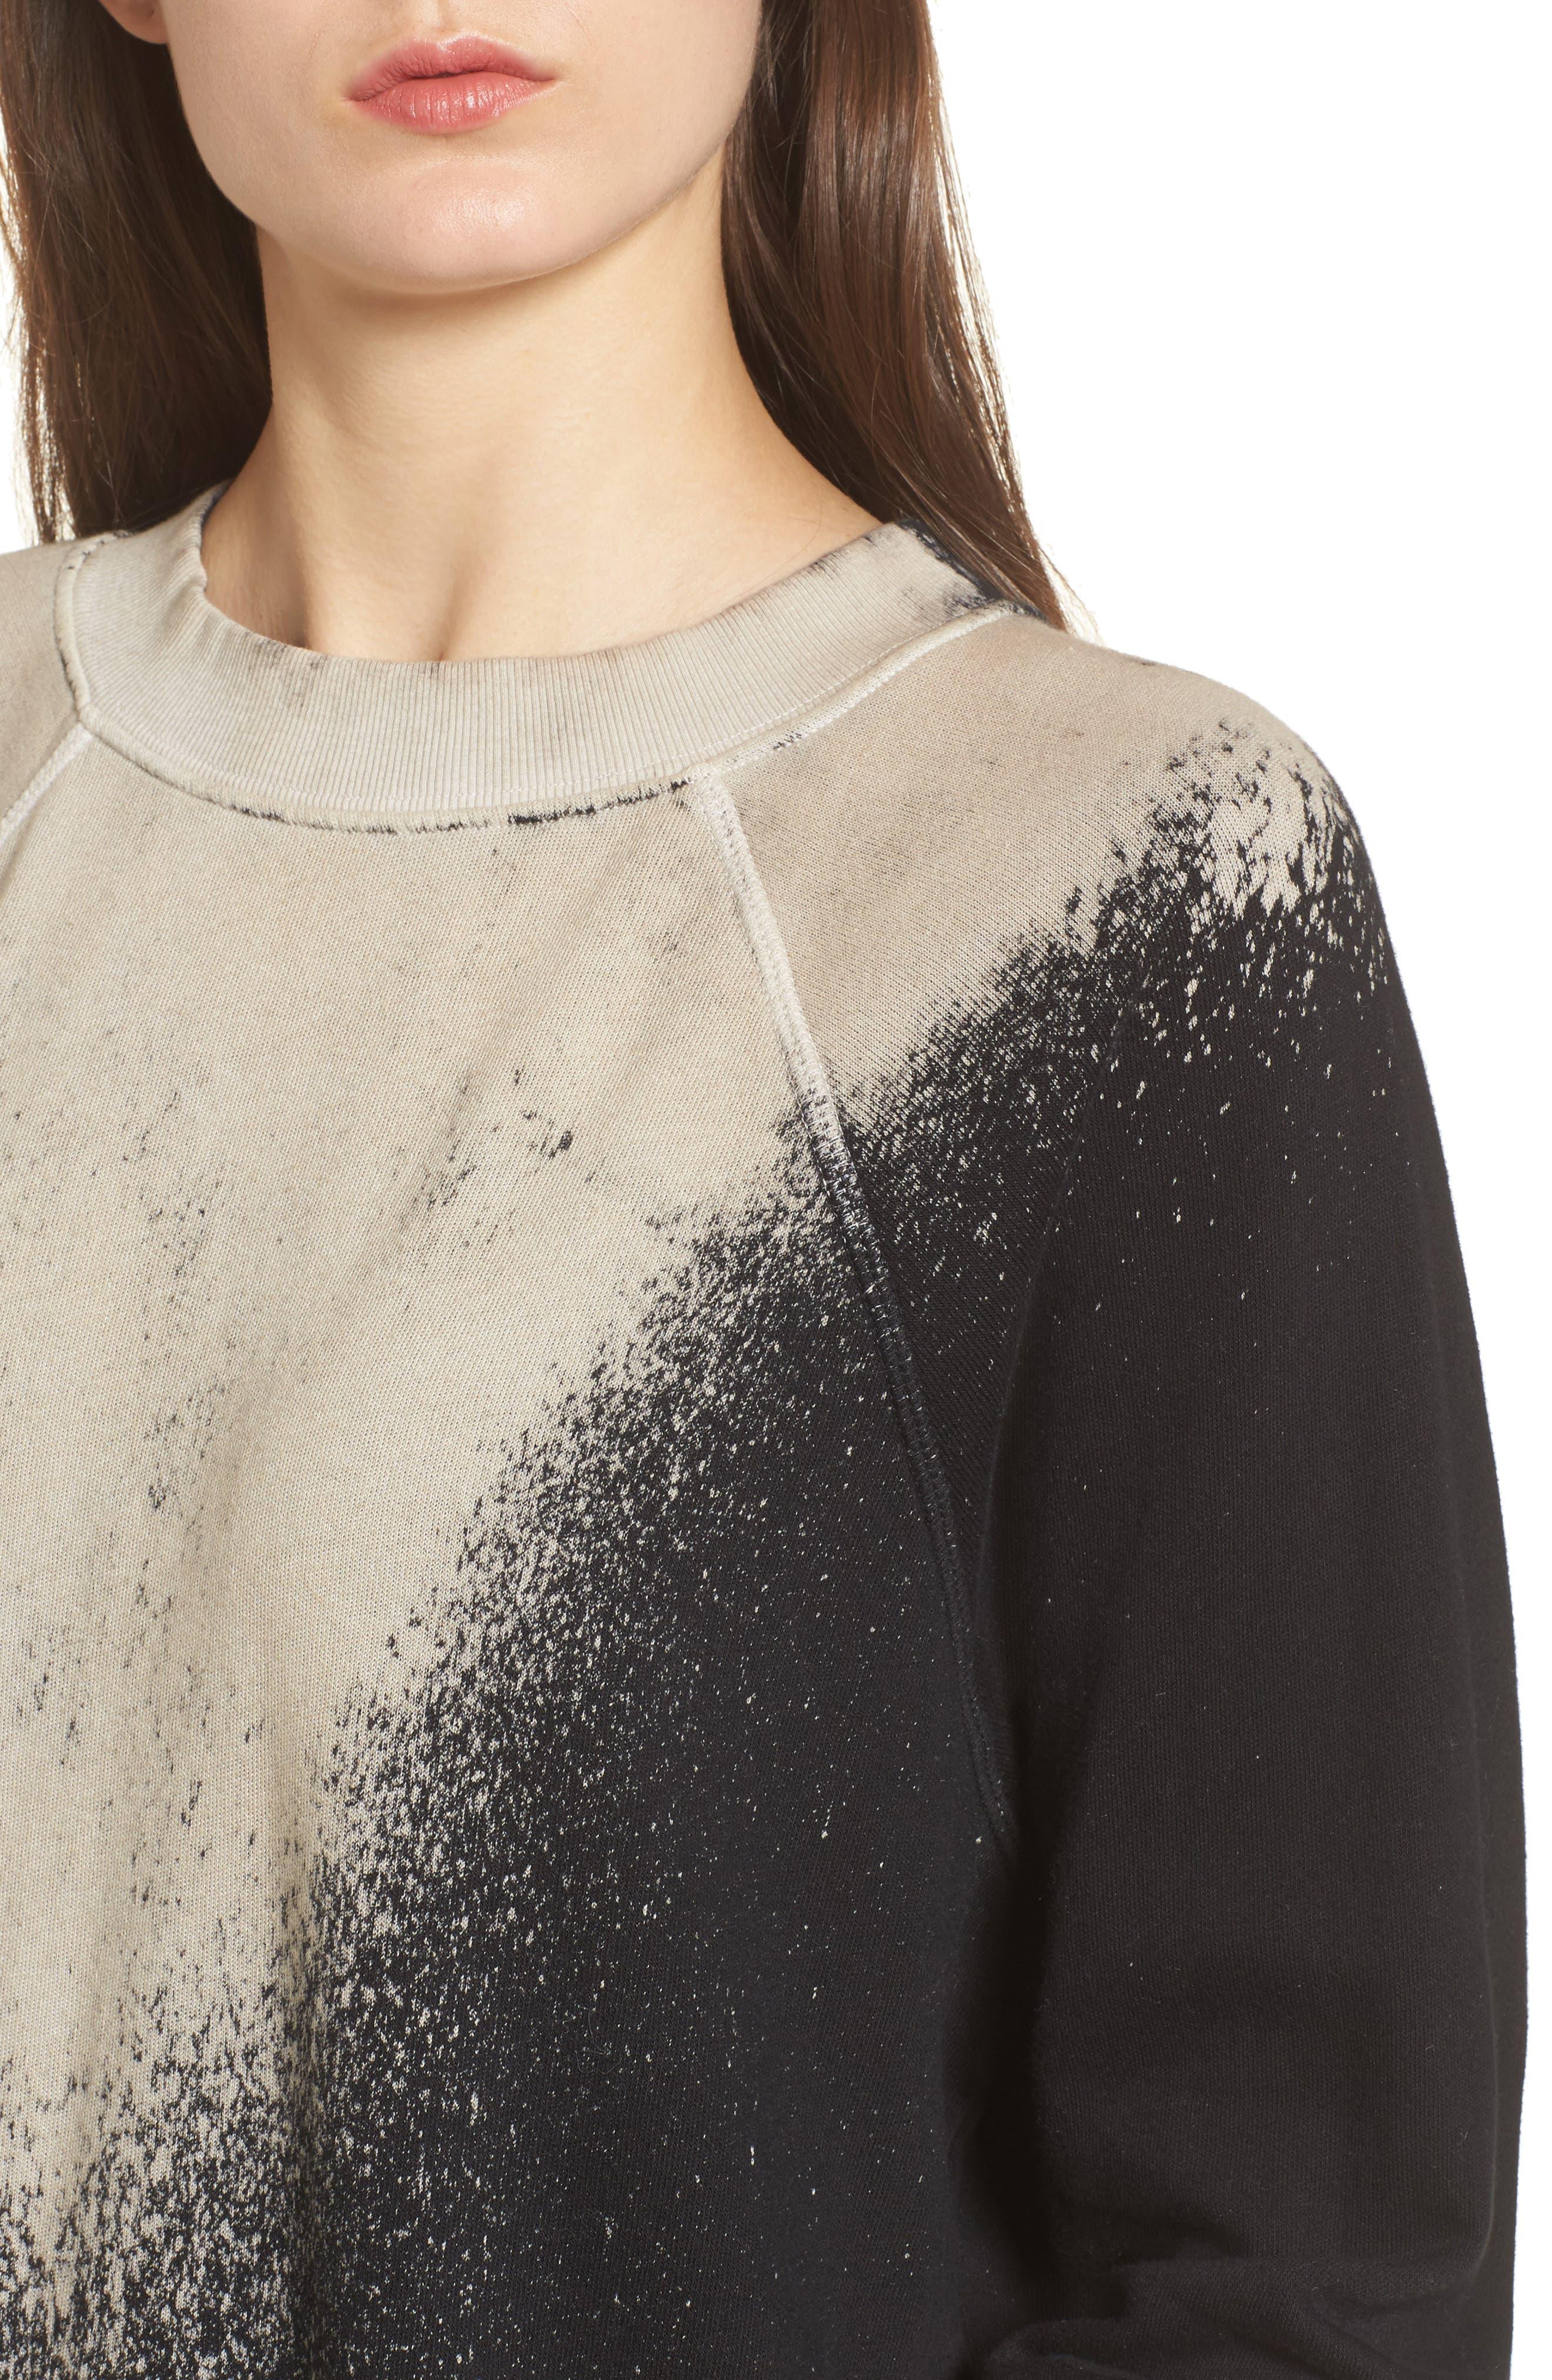 Stardust - Sommers Sweatshirt,                             Alternate thumbnail 4, color,                             003